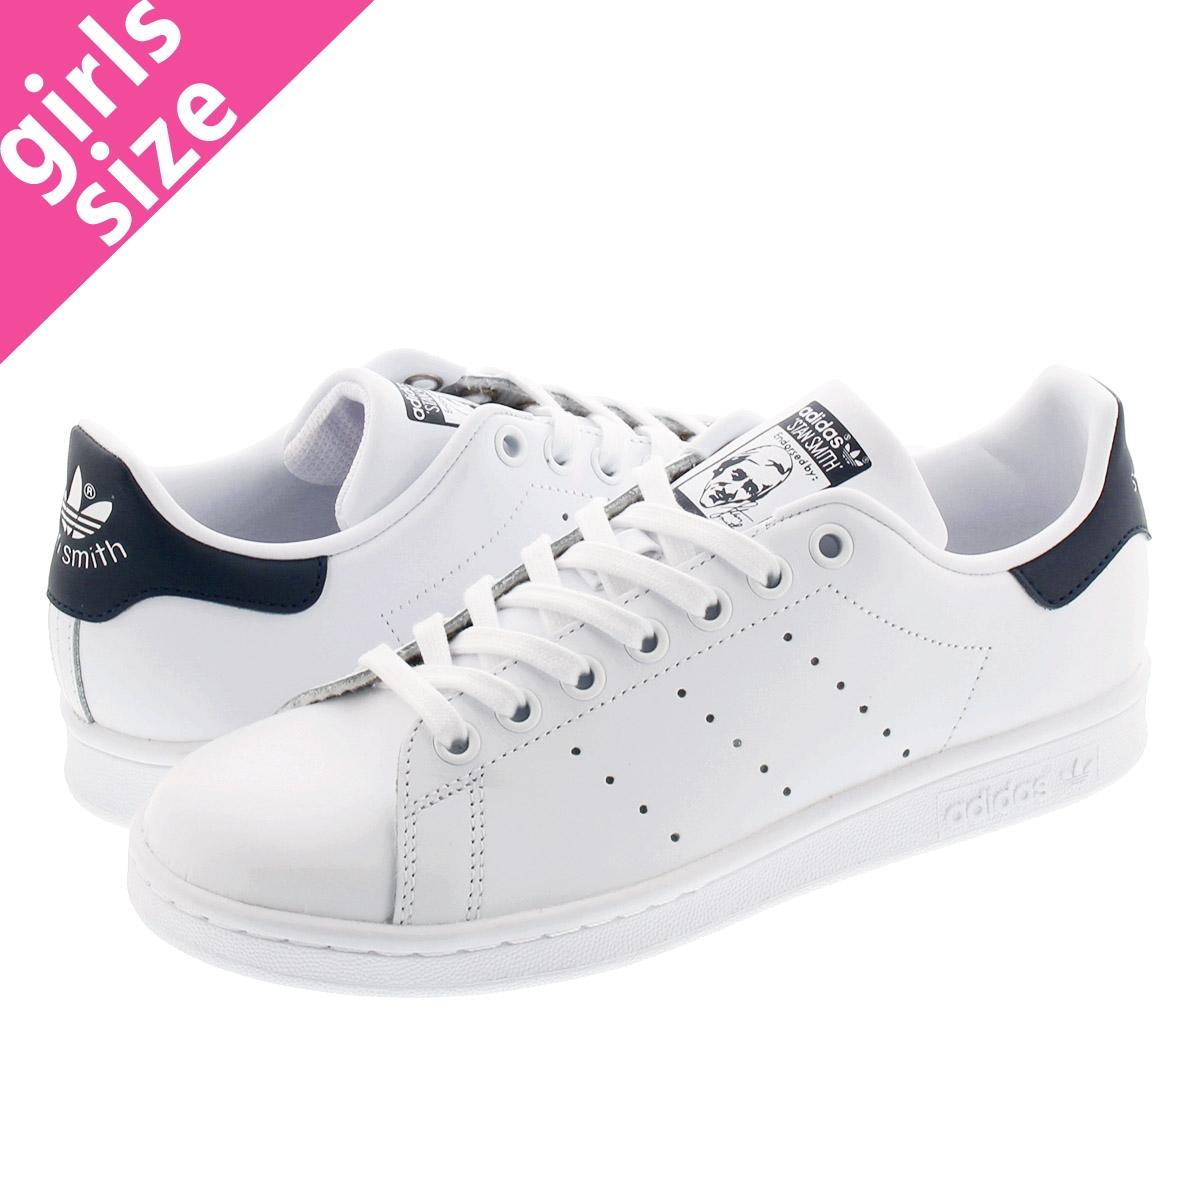 buy popular 2d8d9 ef16d adidas STAN SMITH W Adidas Stan Smith women RUNNING WHITE/COLLEGE NAVY  s81020